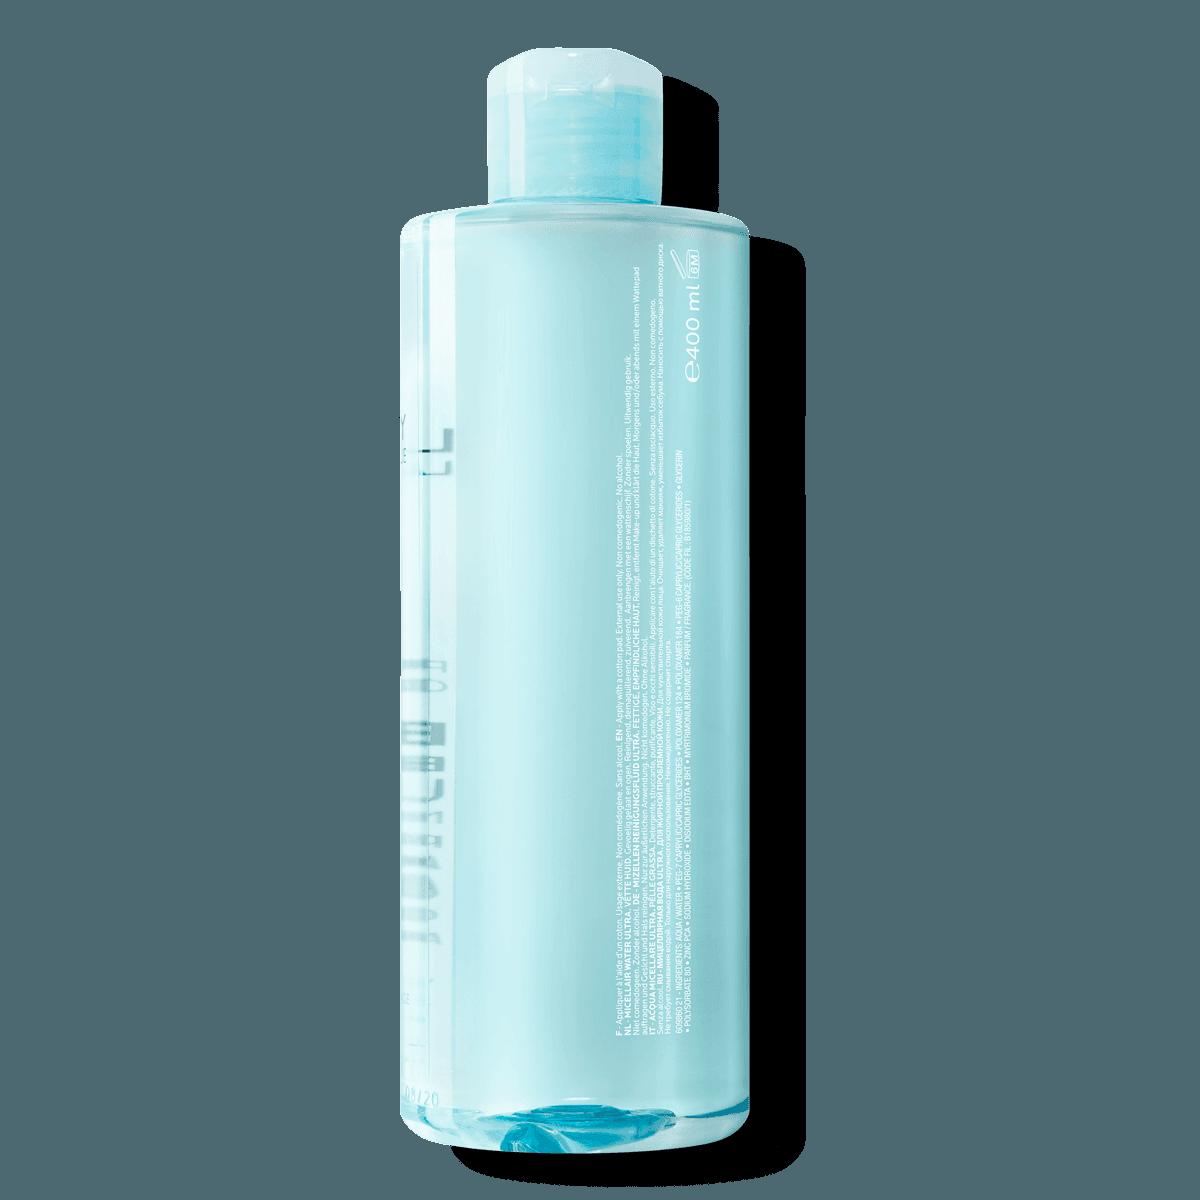 La Roche Posay Kasvojen puhdistustuote Effaclar Micellar Water Ultra 400ml 33378